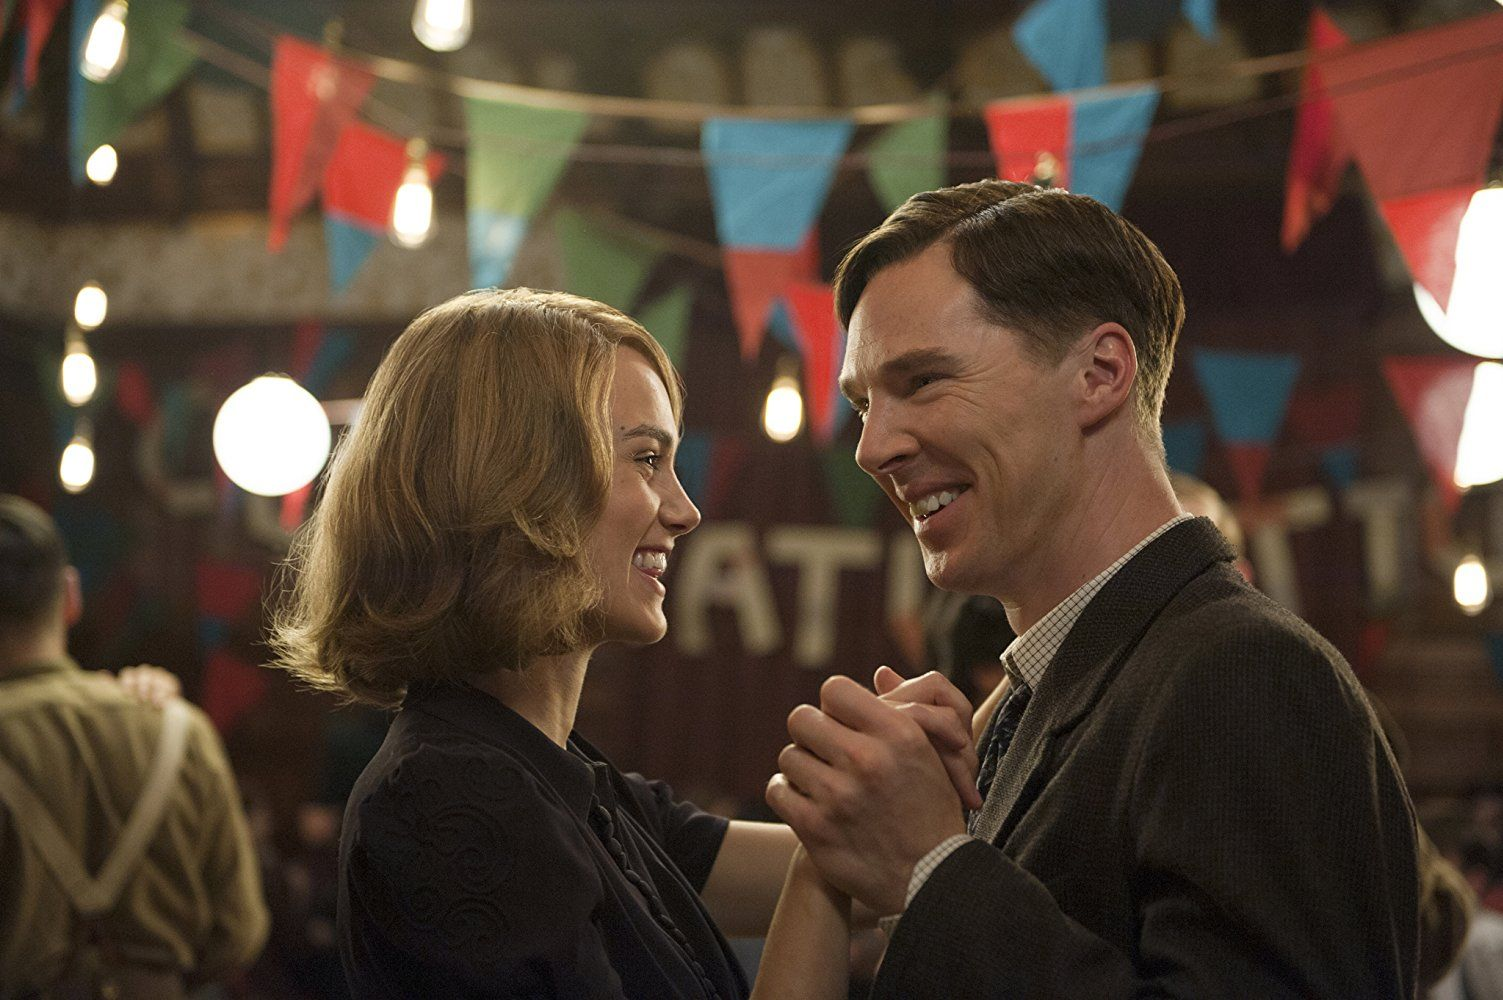 The Imitation Game |  trama |  cast e curiosità del film con Benedict Cumberbatch